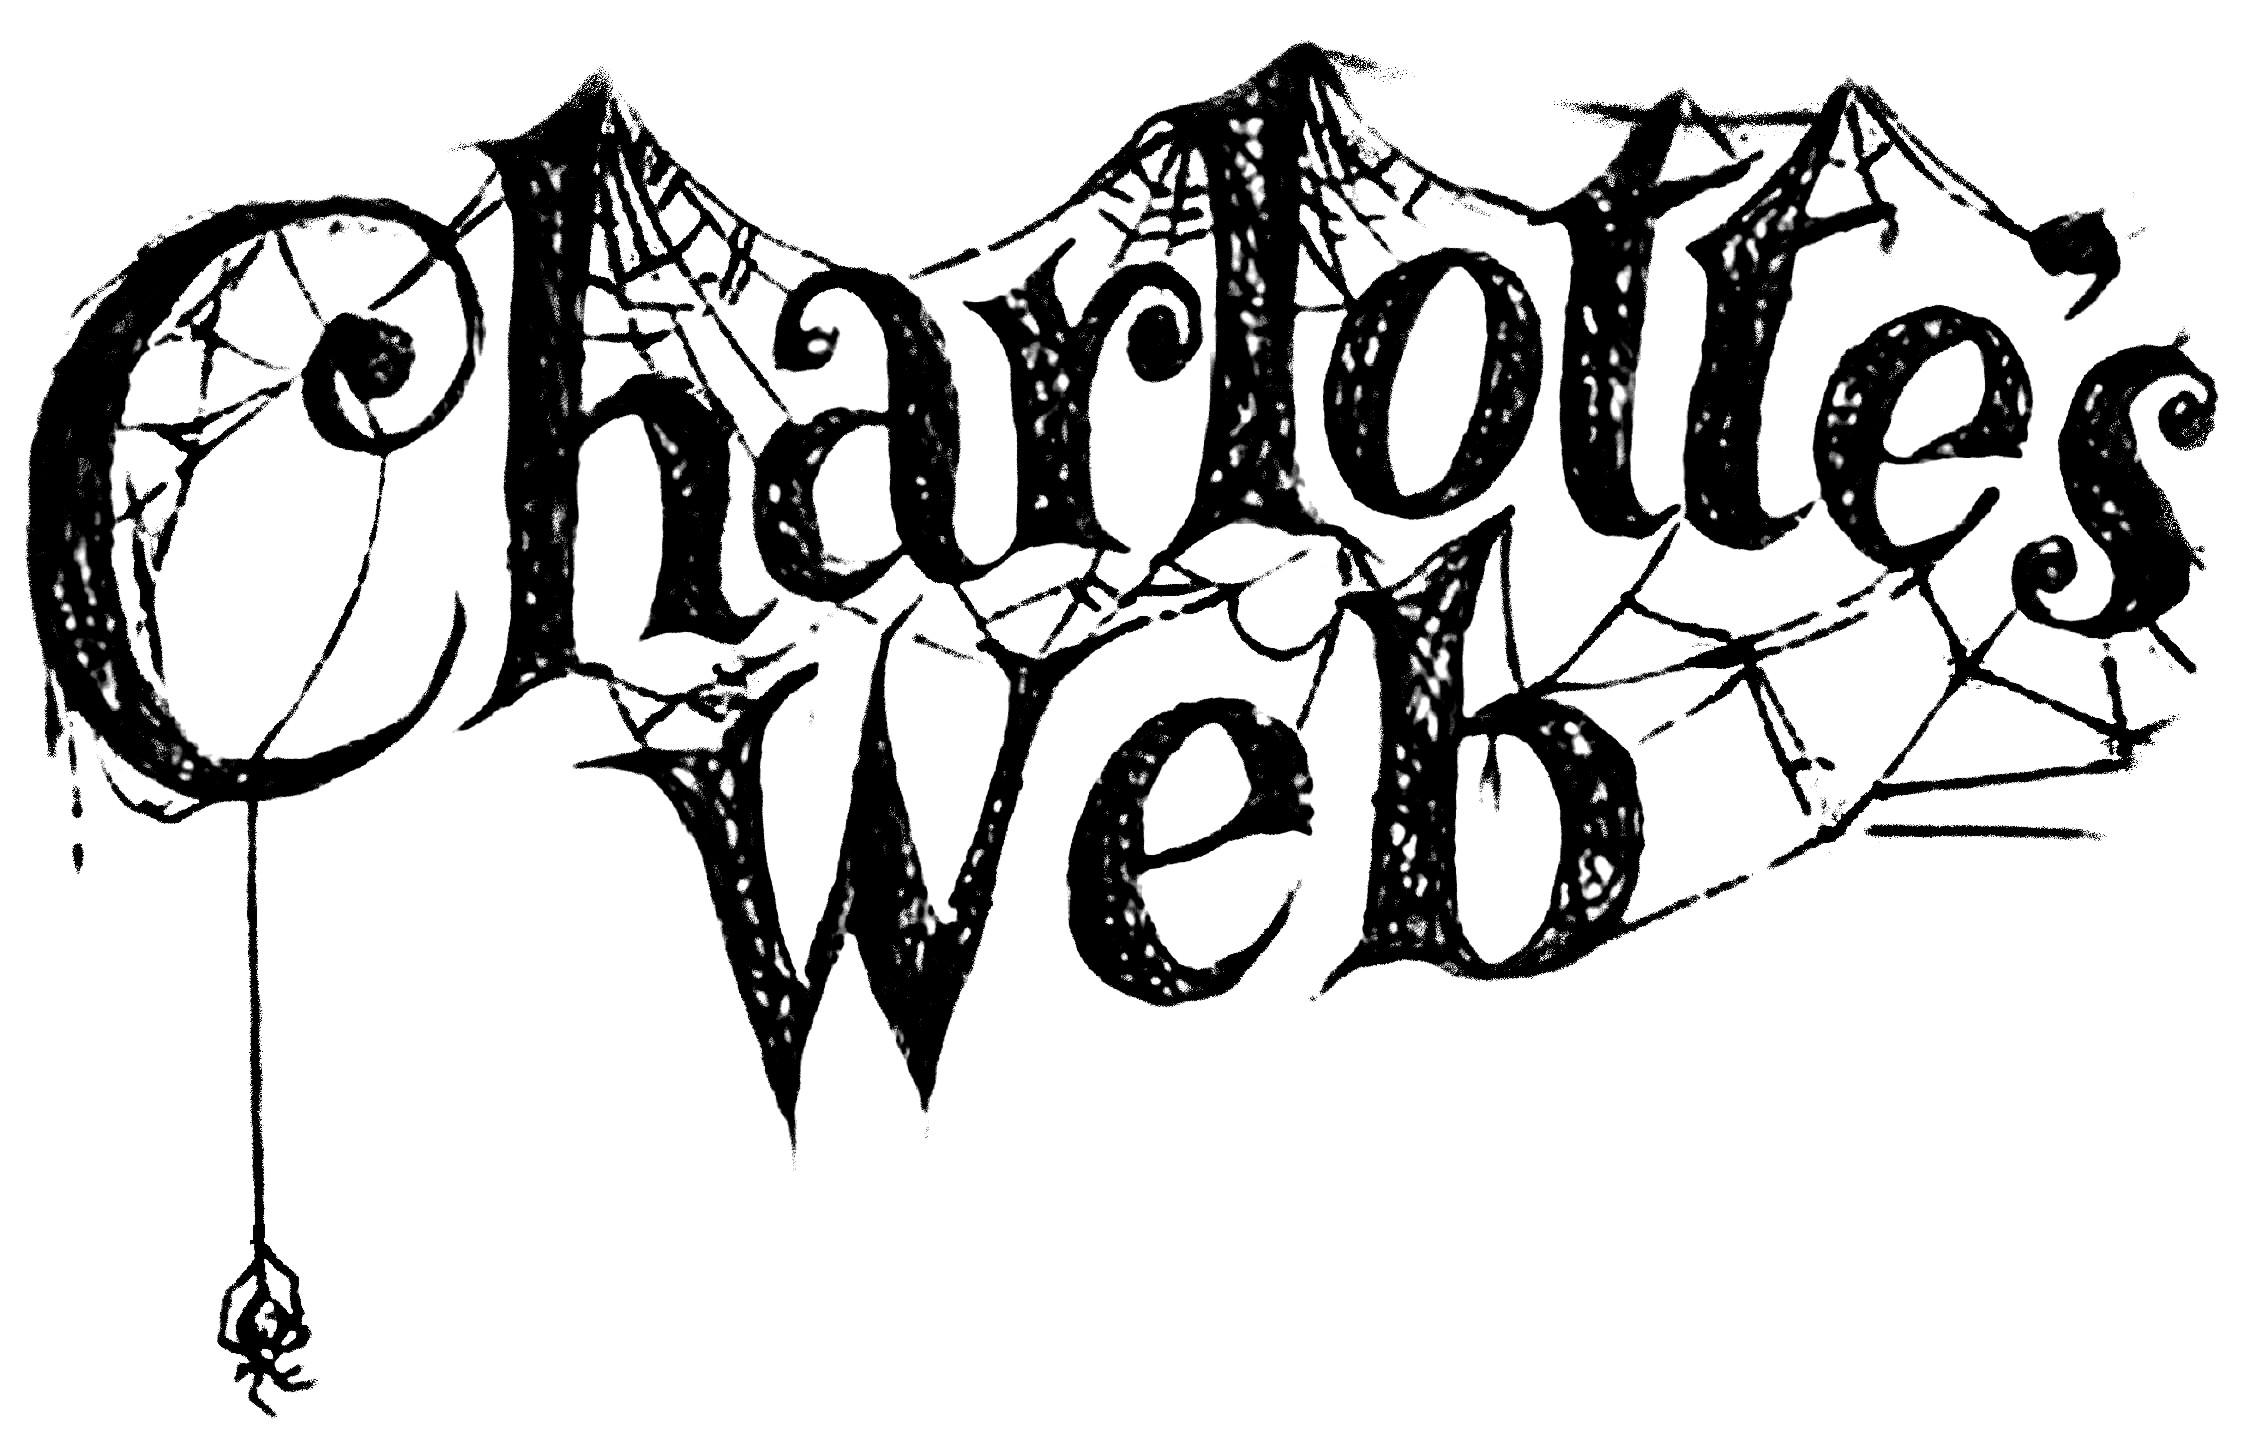 13 Charlotte S Web Font Images